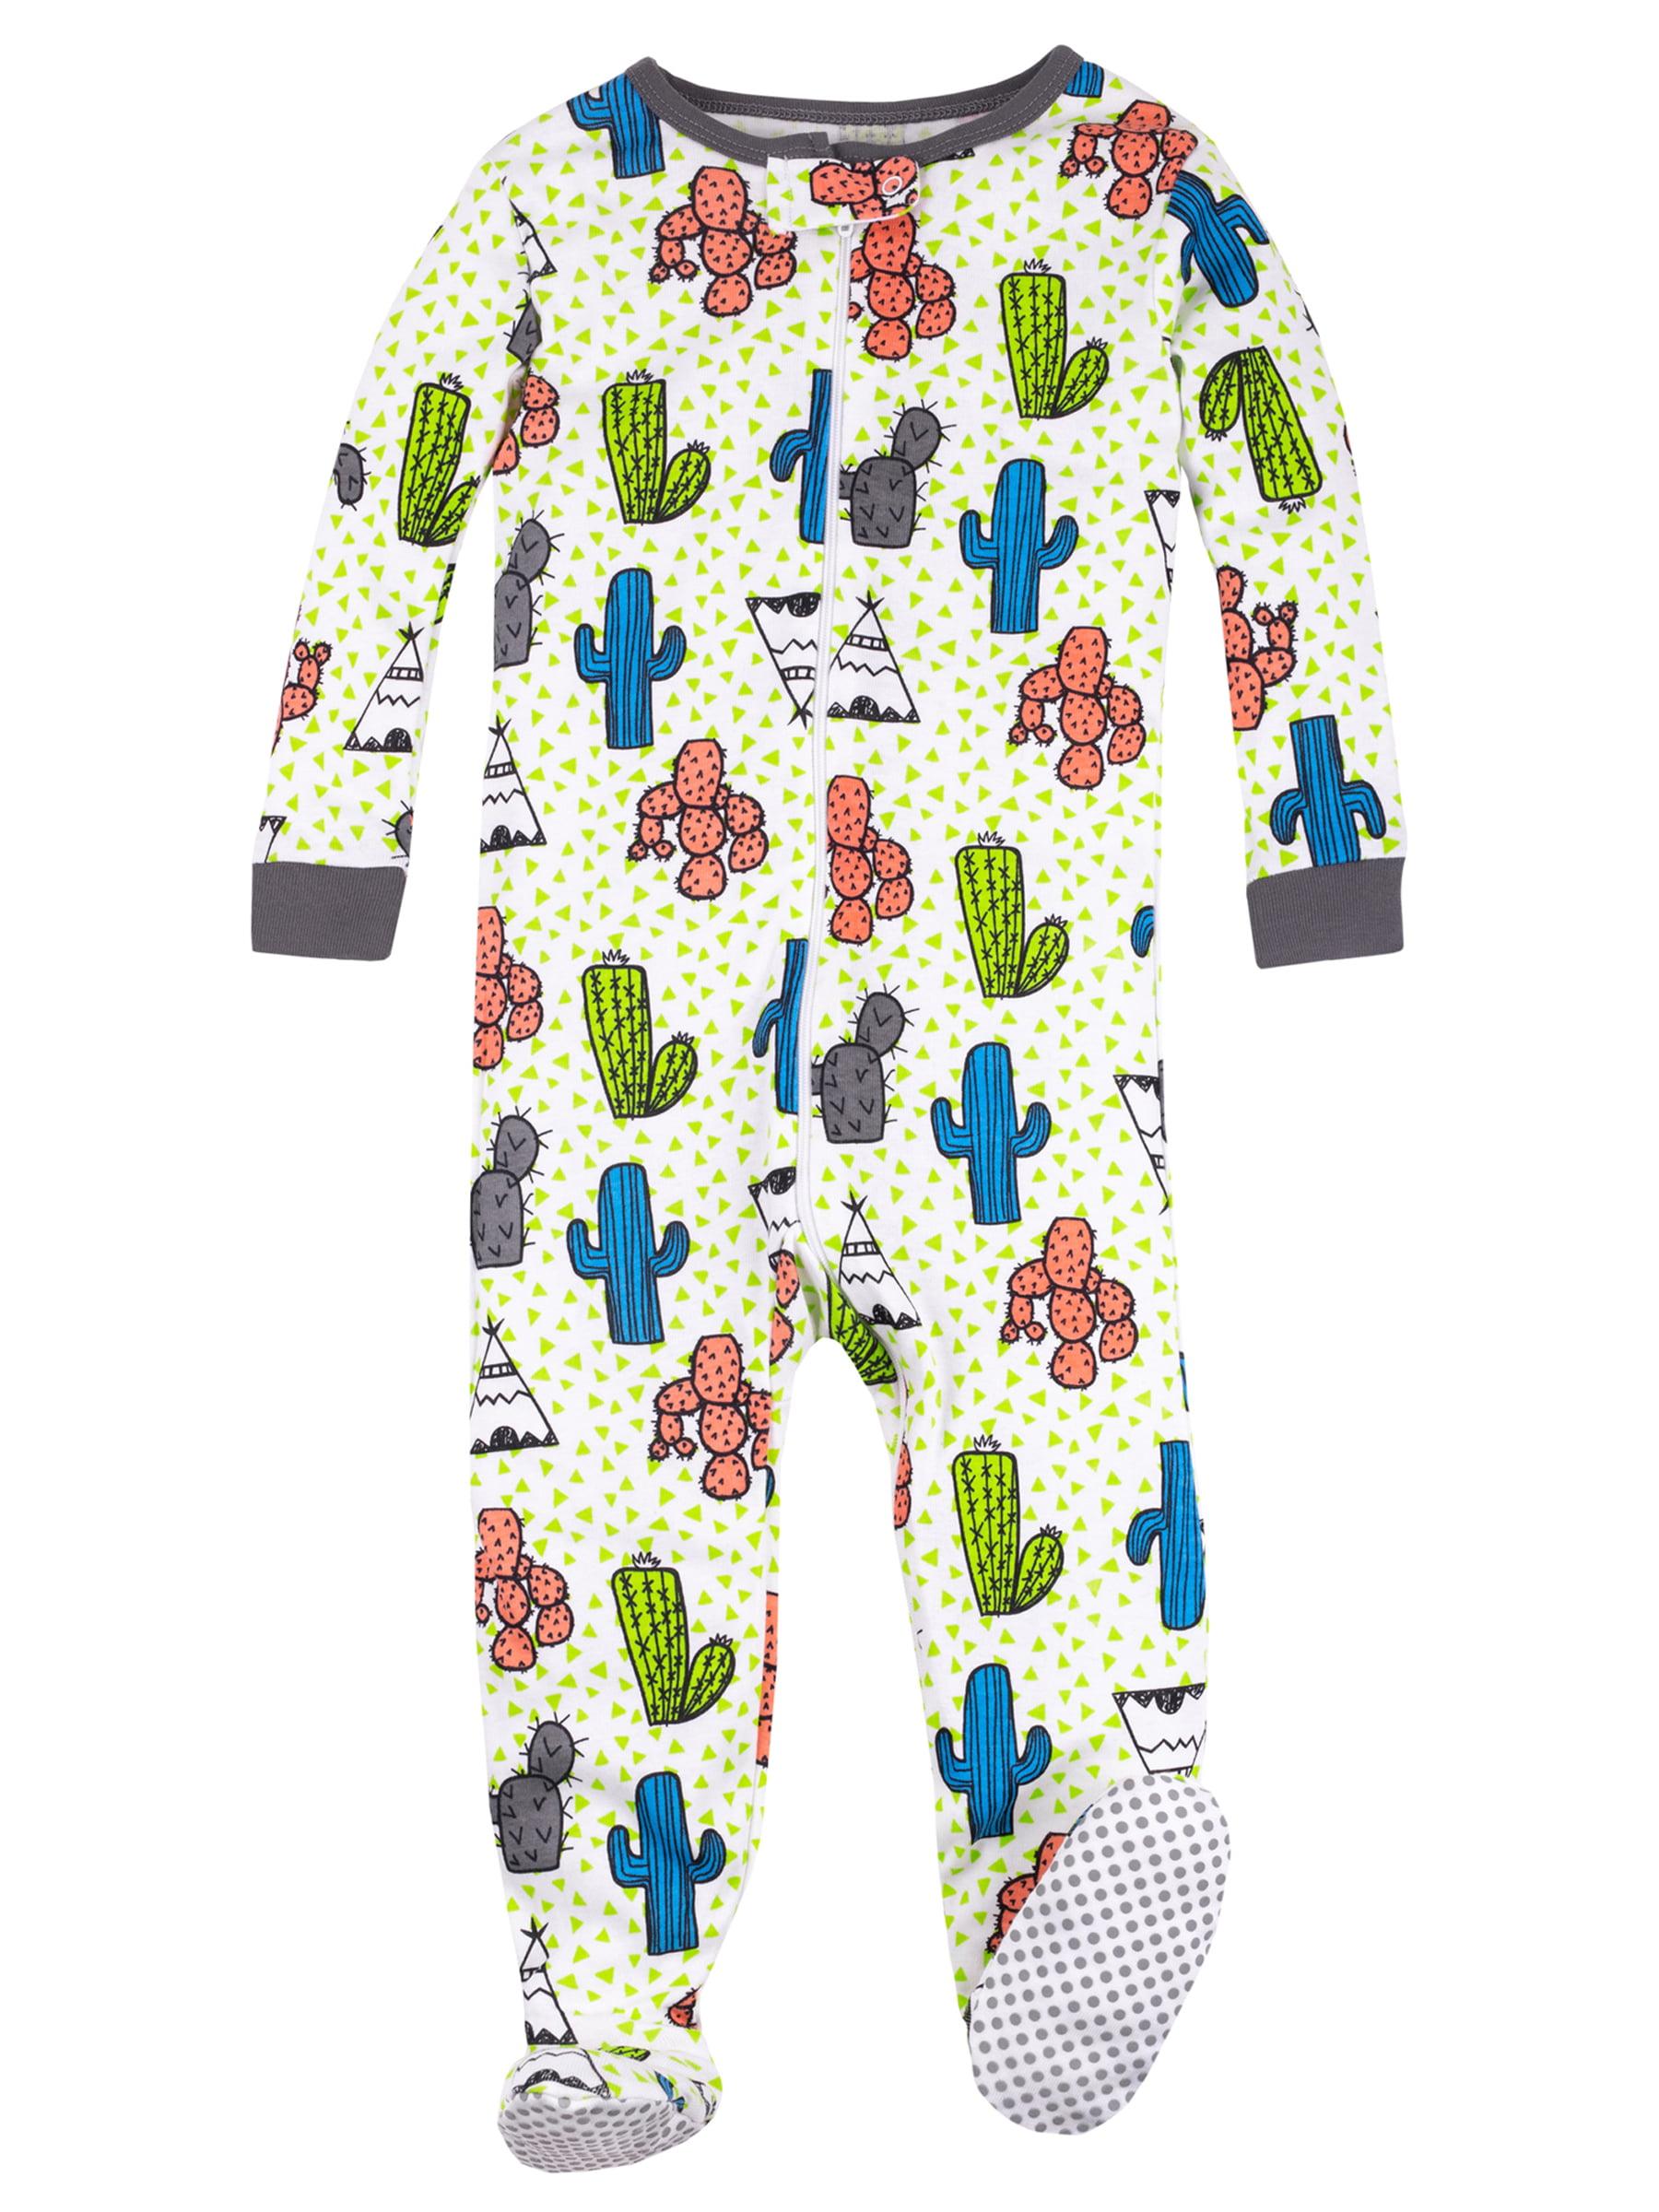 Boy Lamaze Organic Baby Organic Baby//Toddler Girl Unisex Tight Fit Pajamas Set